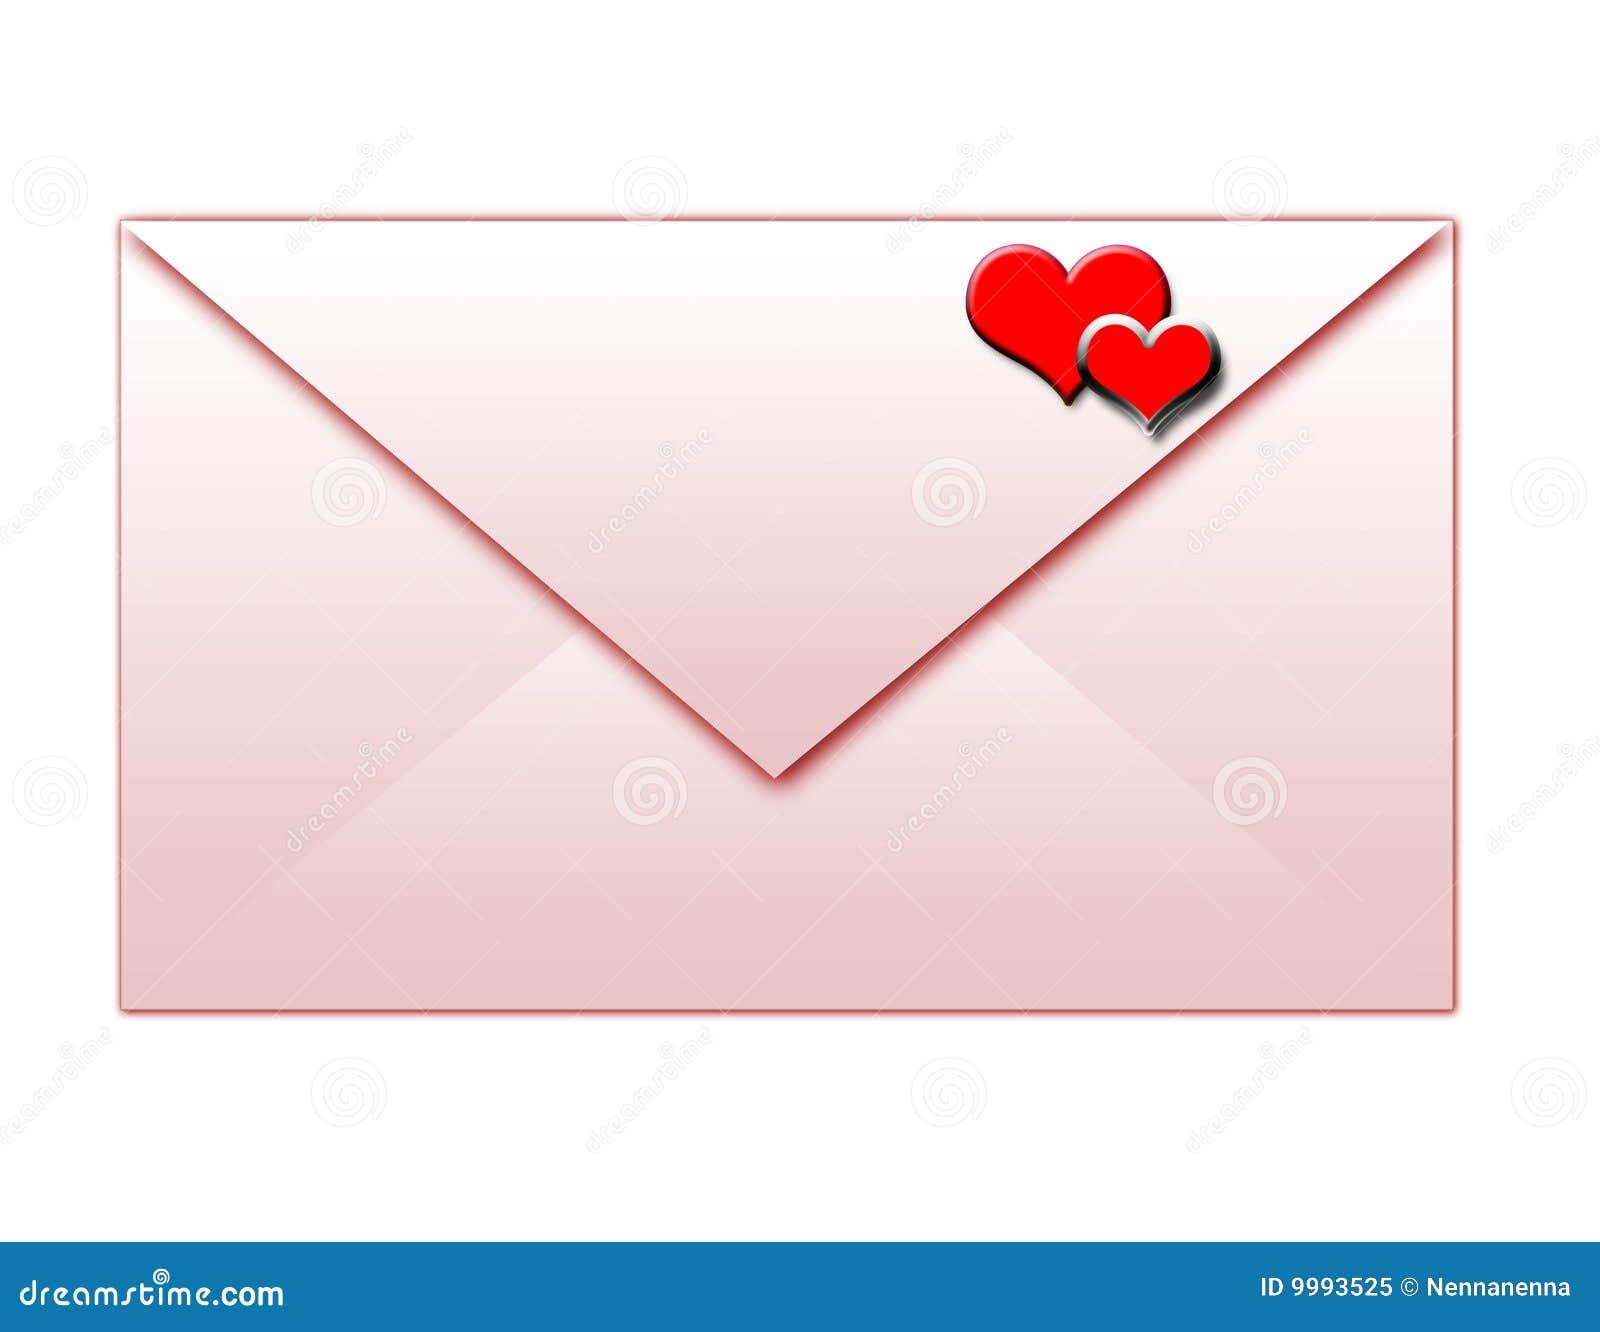 pink envelope isolated stock illustration illustration of global rh dreamstime com Valentine's Day Clip Art Cars Gift Clip Art